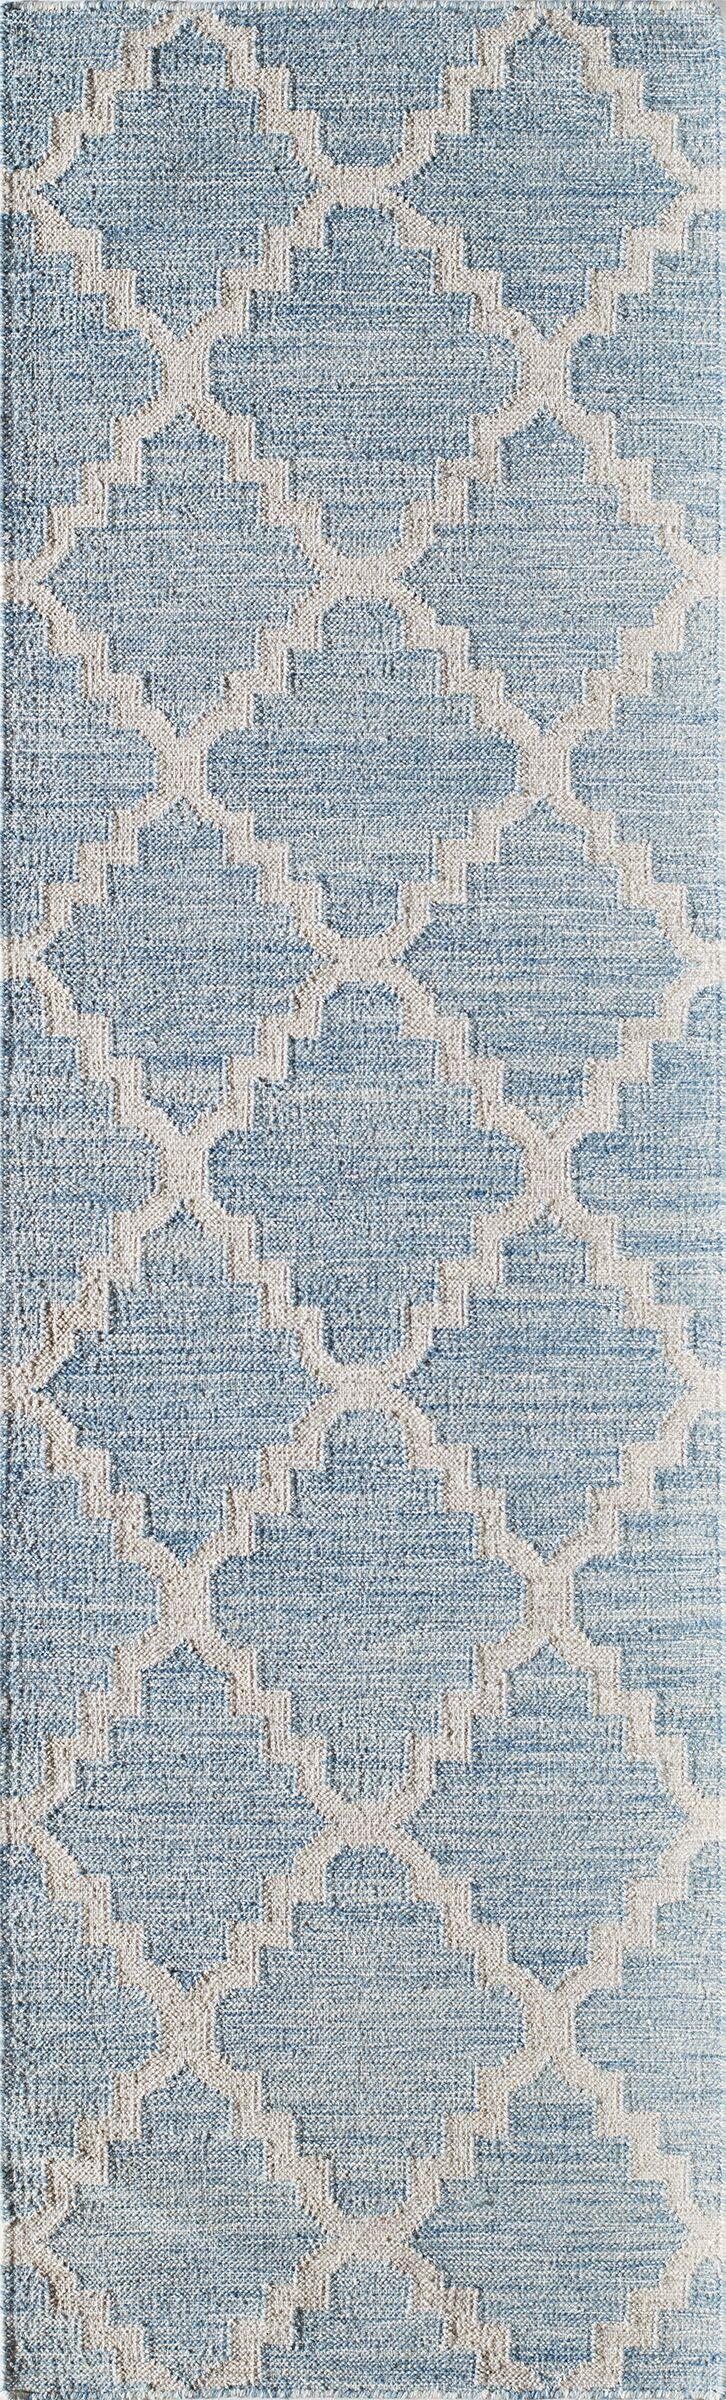 Zara Hand-Woven Blue Area Rug Rug Size: Runner 2'3